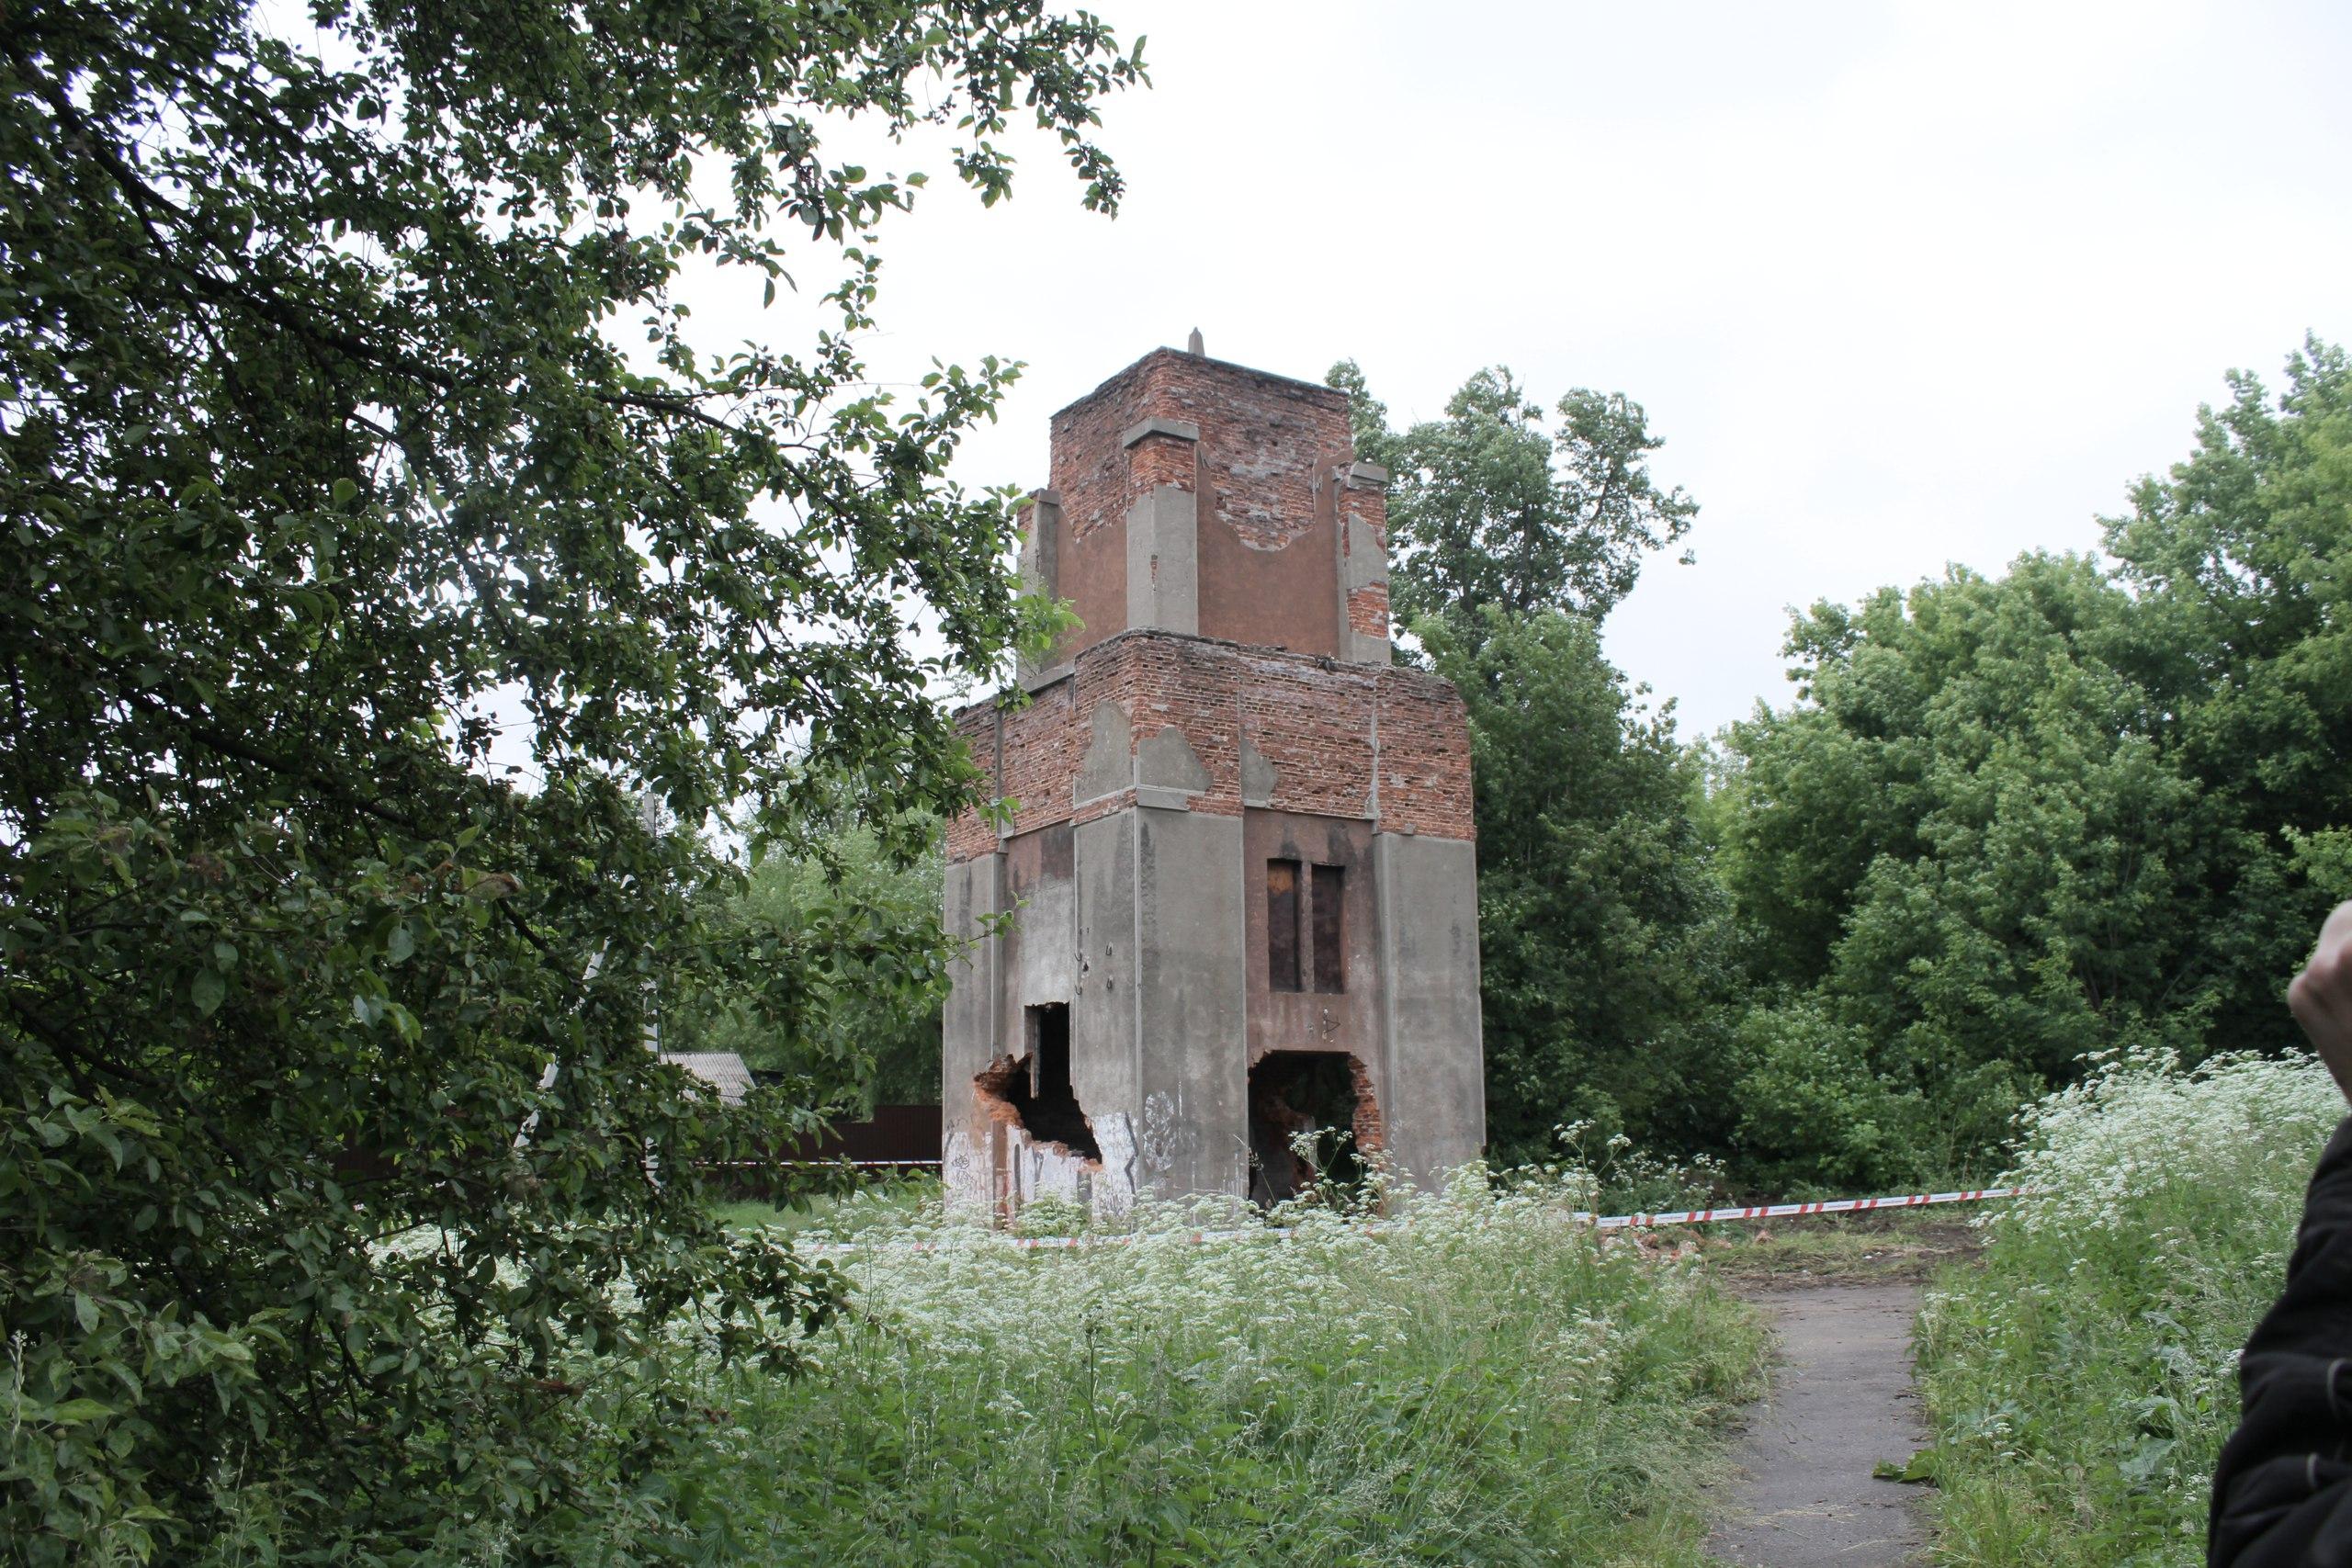 Артезианская скважина в Серпухове перед сносом